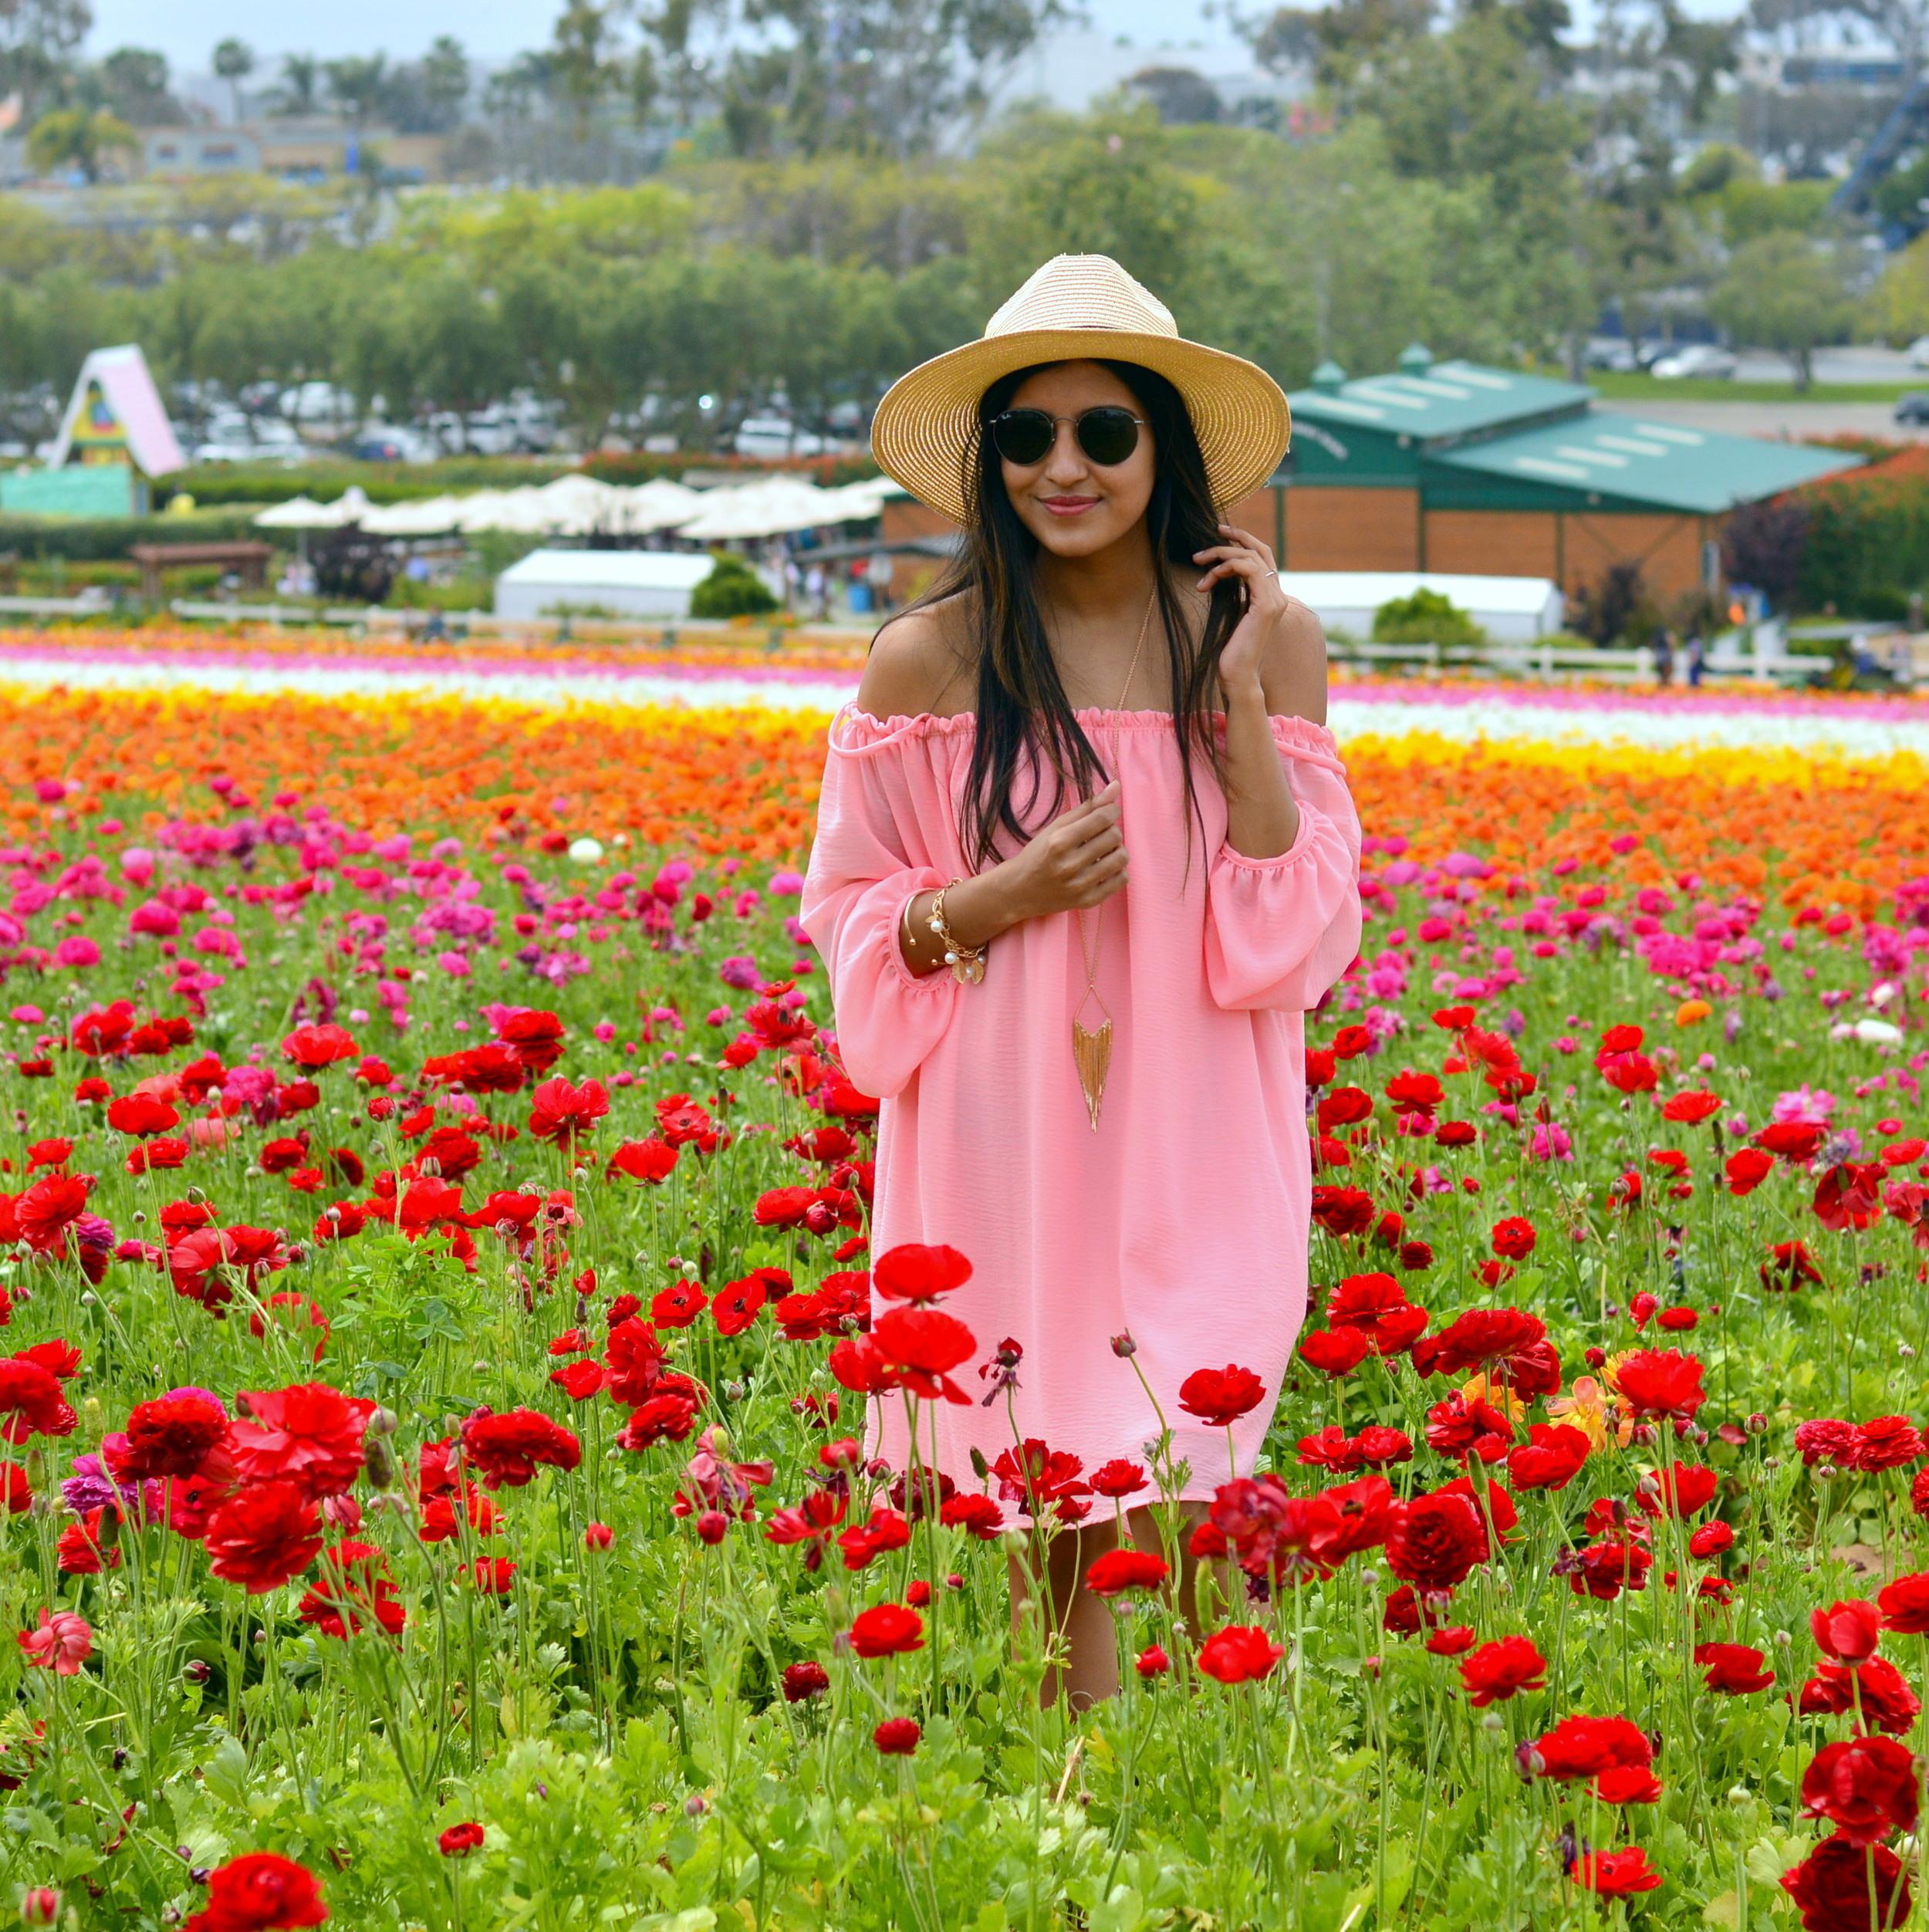 off-shoulder-dress-boho-festival-style-blogger-outfit 2